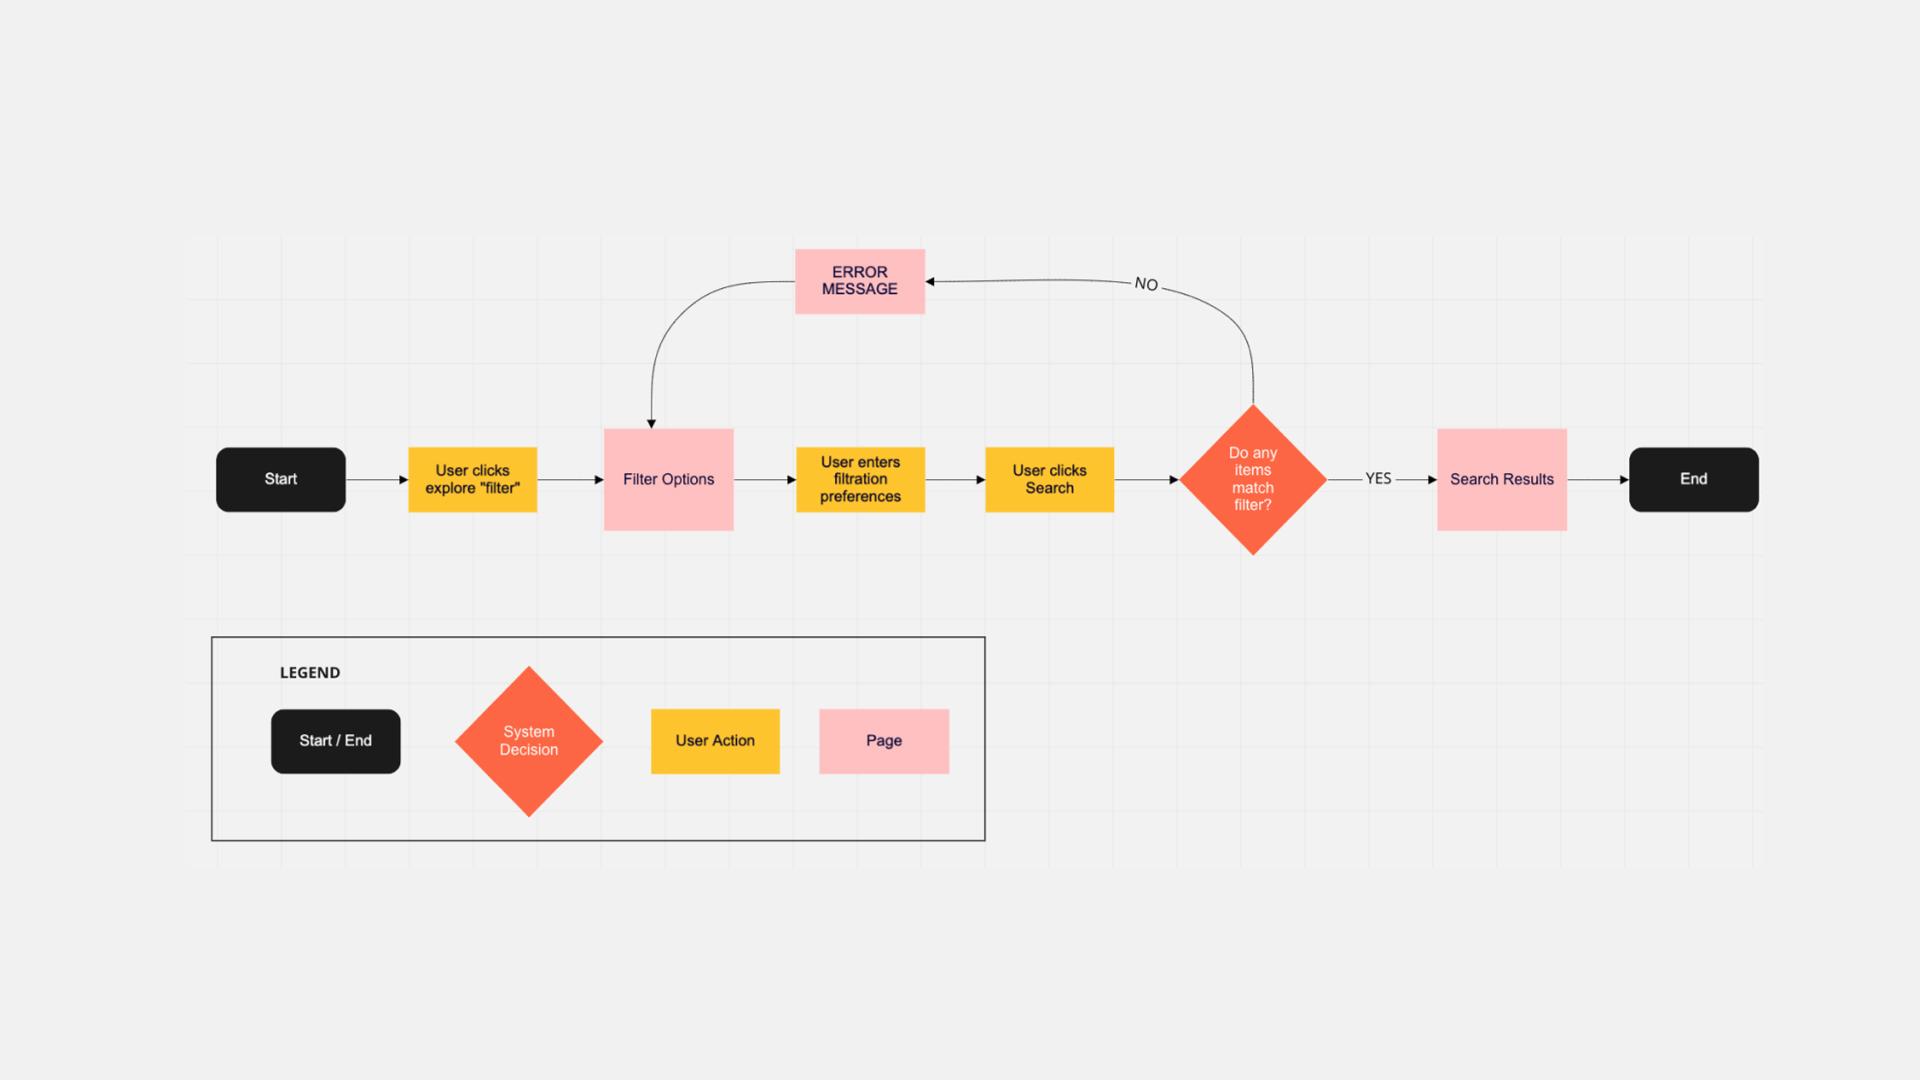 Task Flow Analysis